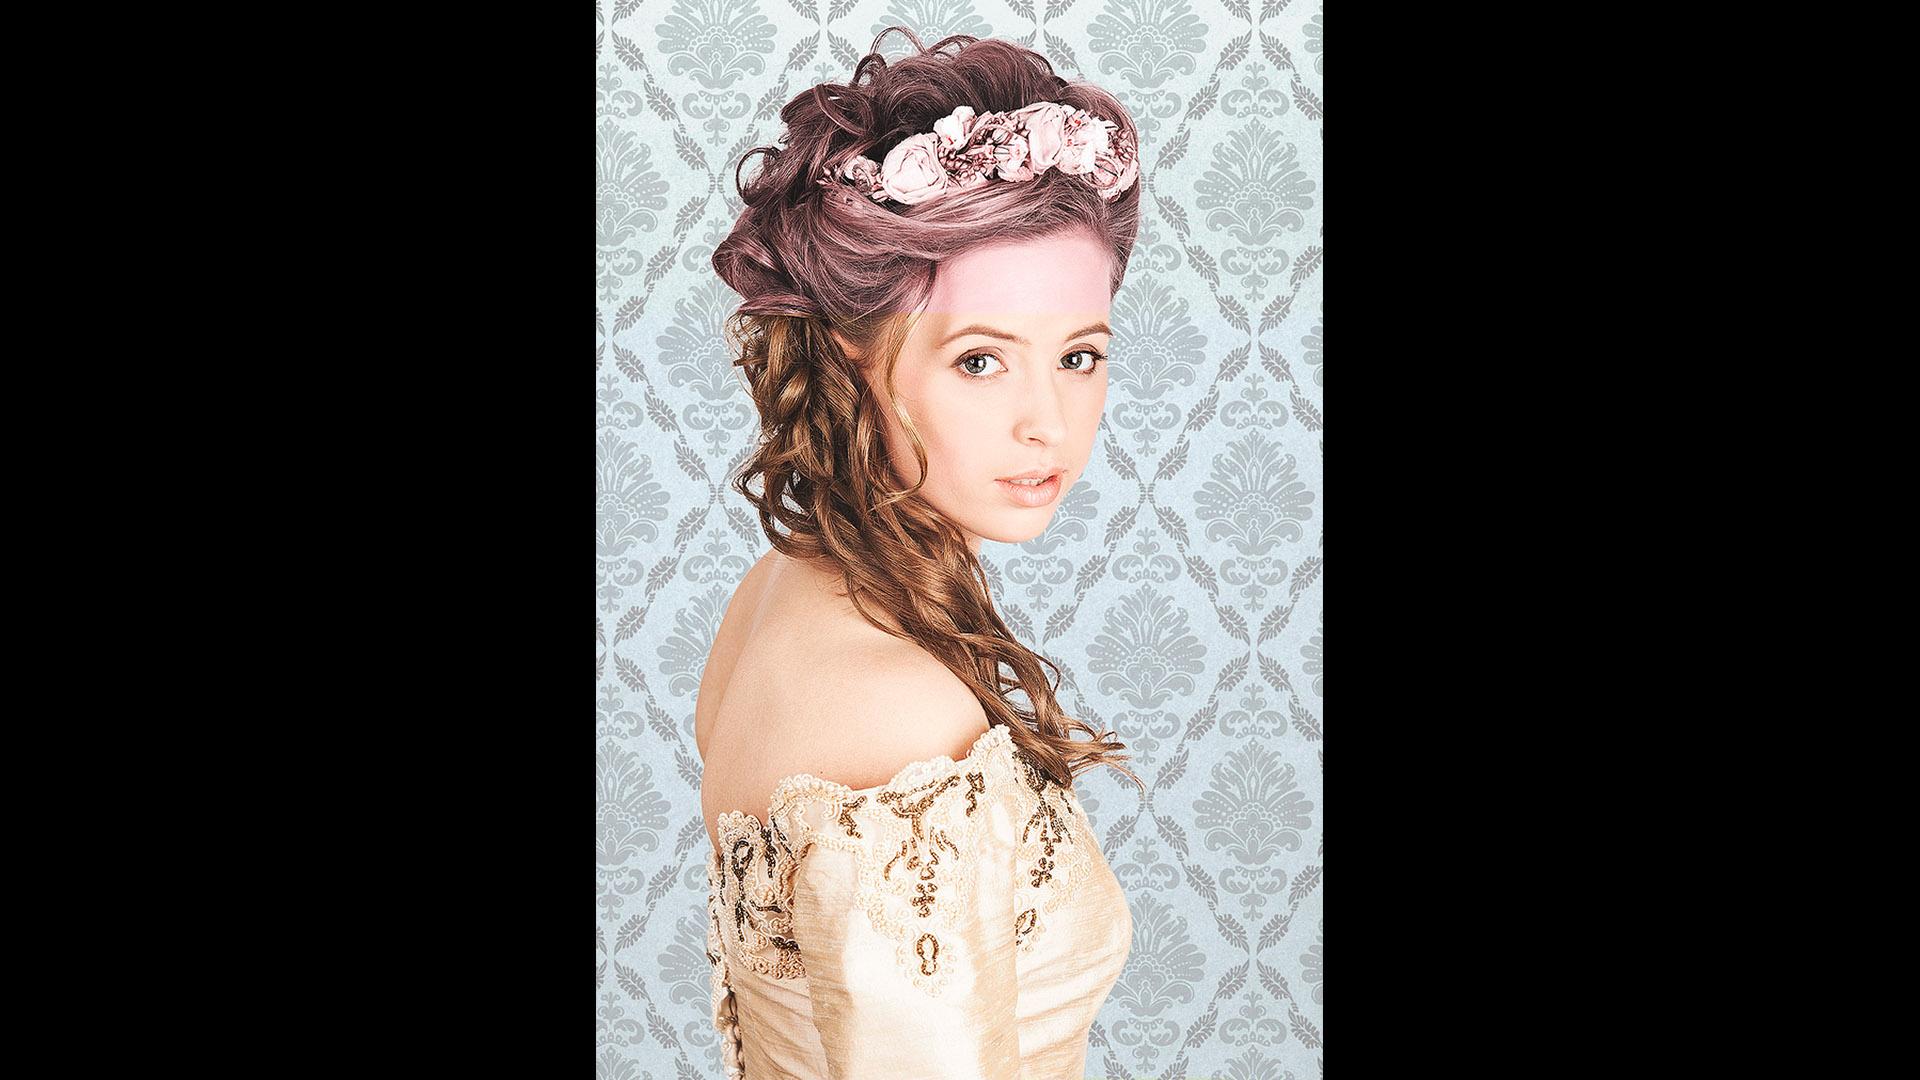 POTD Alex Robson Georgia-Bride Photofocus Photographer of the Day